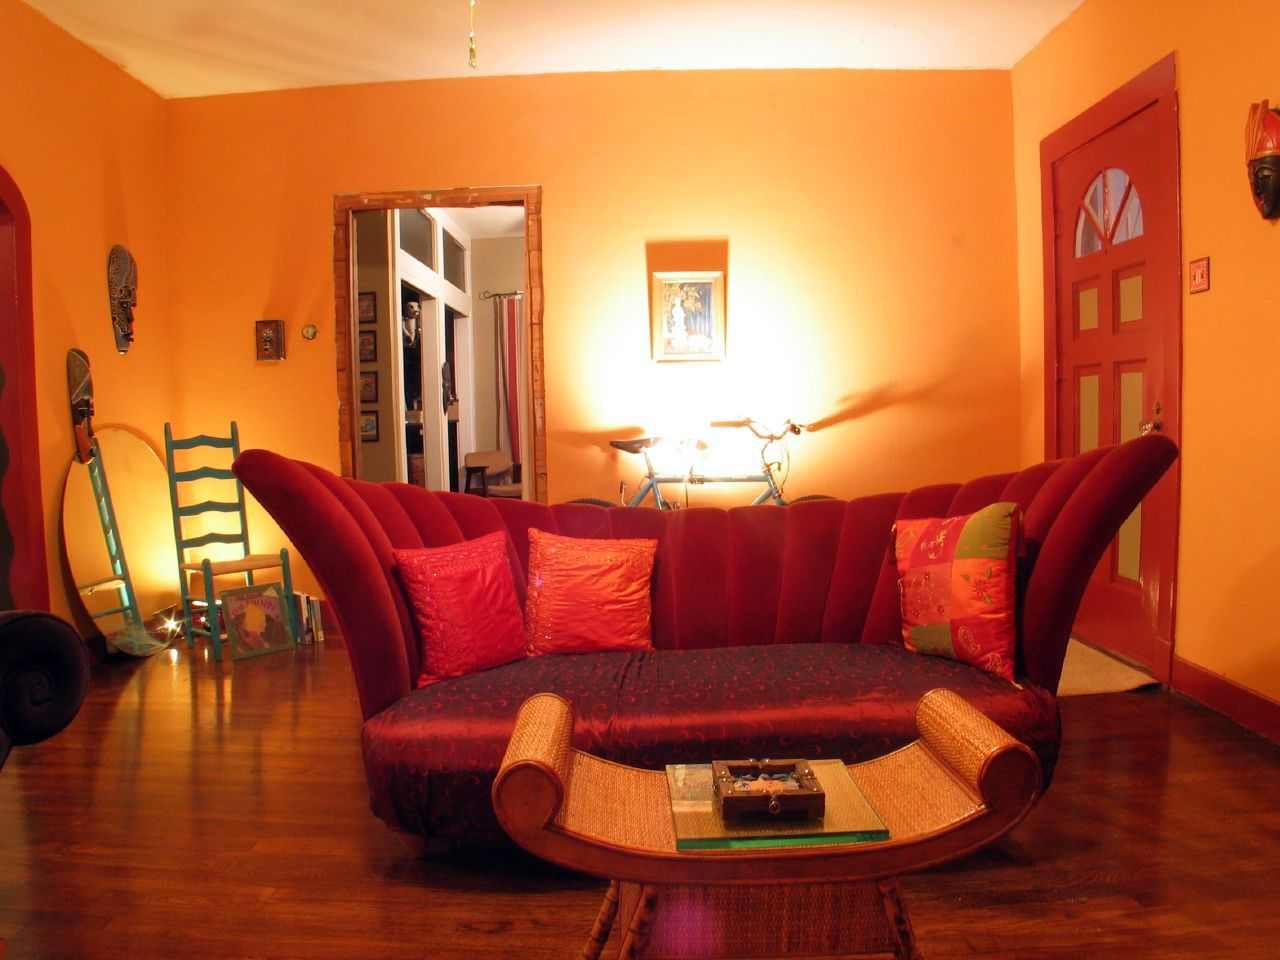 Pinbristol Essendon On Bristol Essendon Orange Interior Colour Impressive Red Sofa Design Living Room Inspiration Design